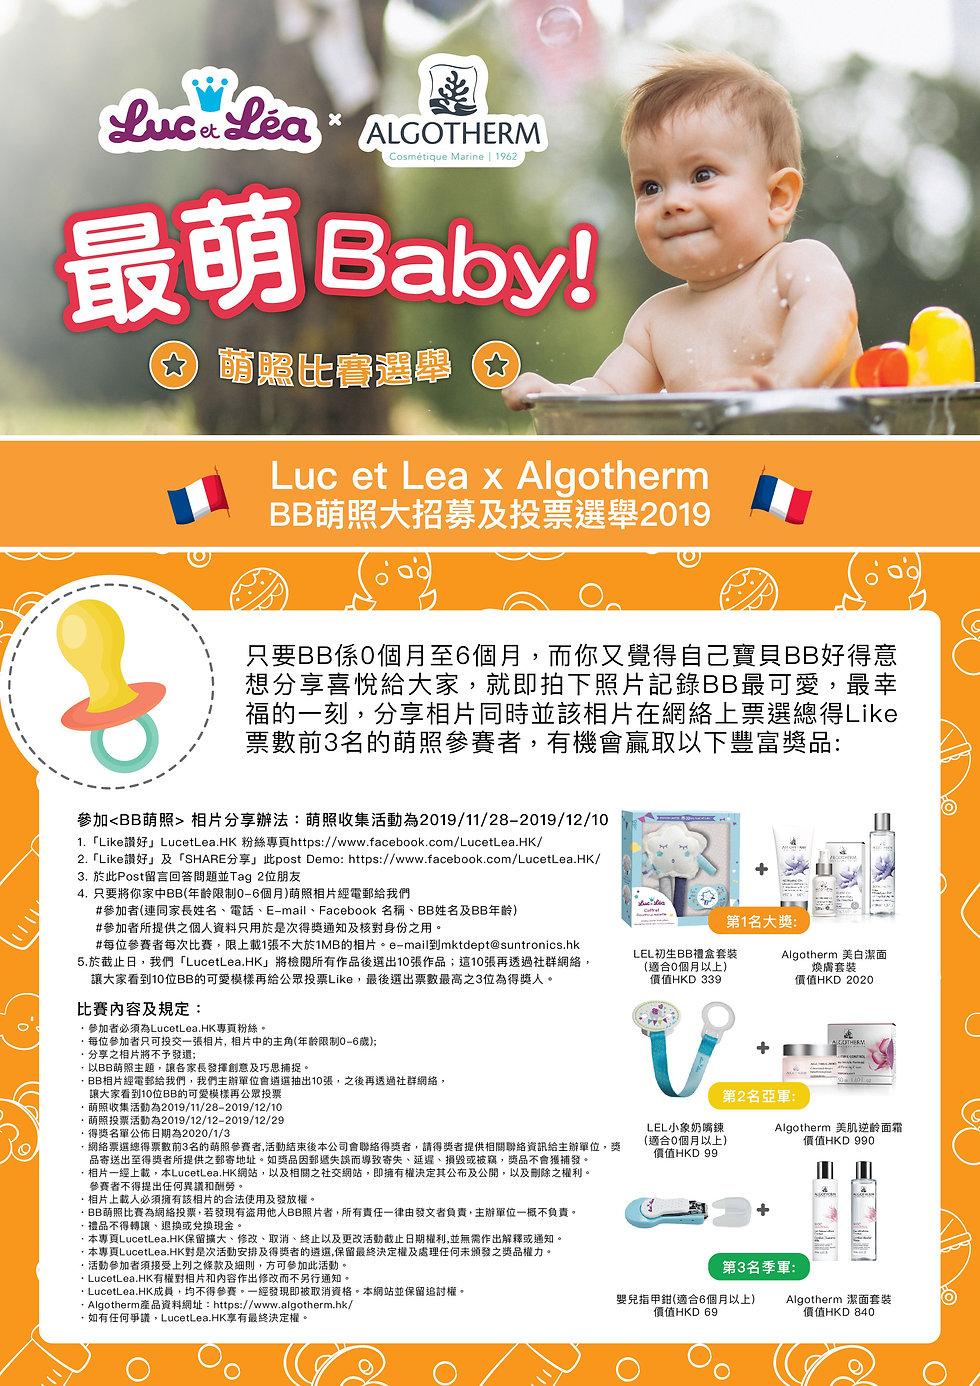 20191106_cutie_baby_part2_fbs-01.jpg